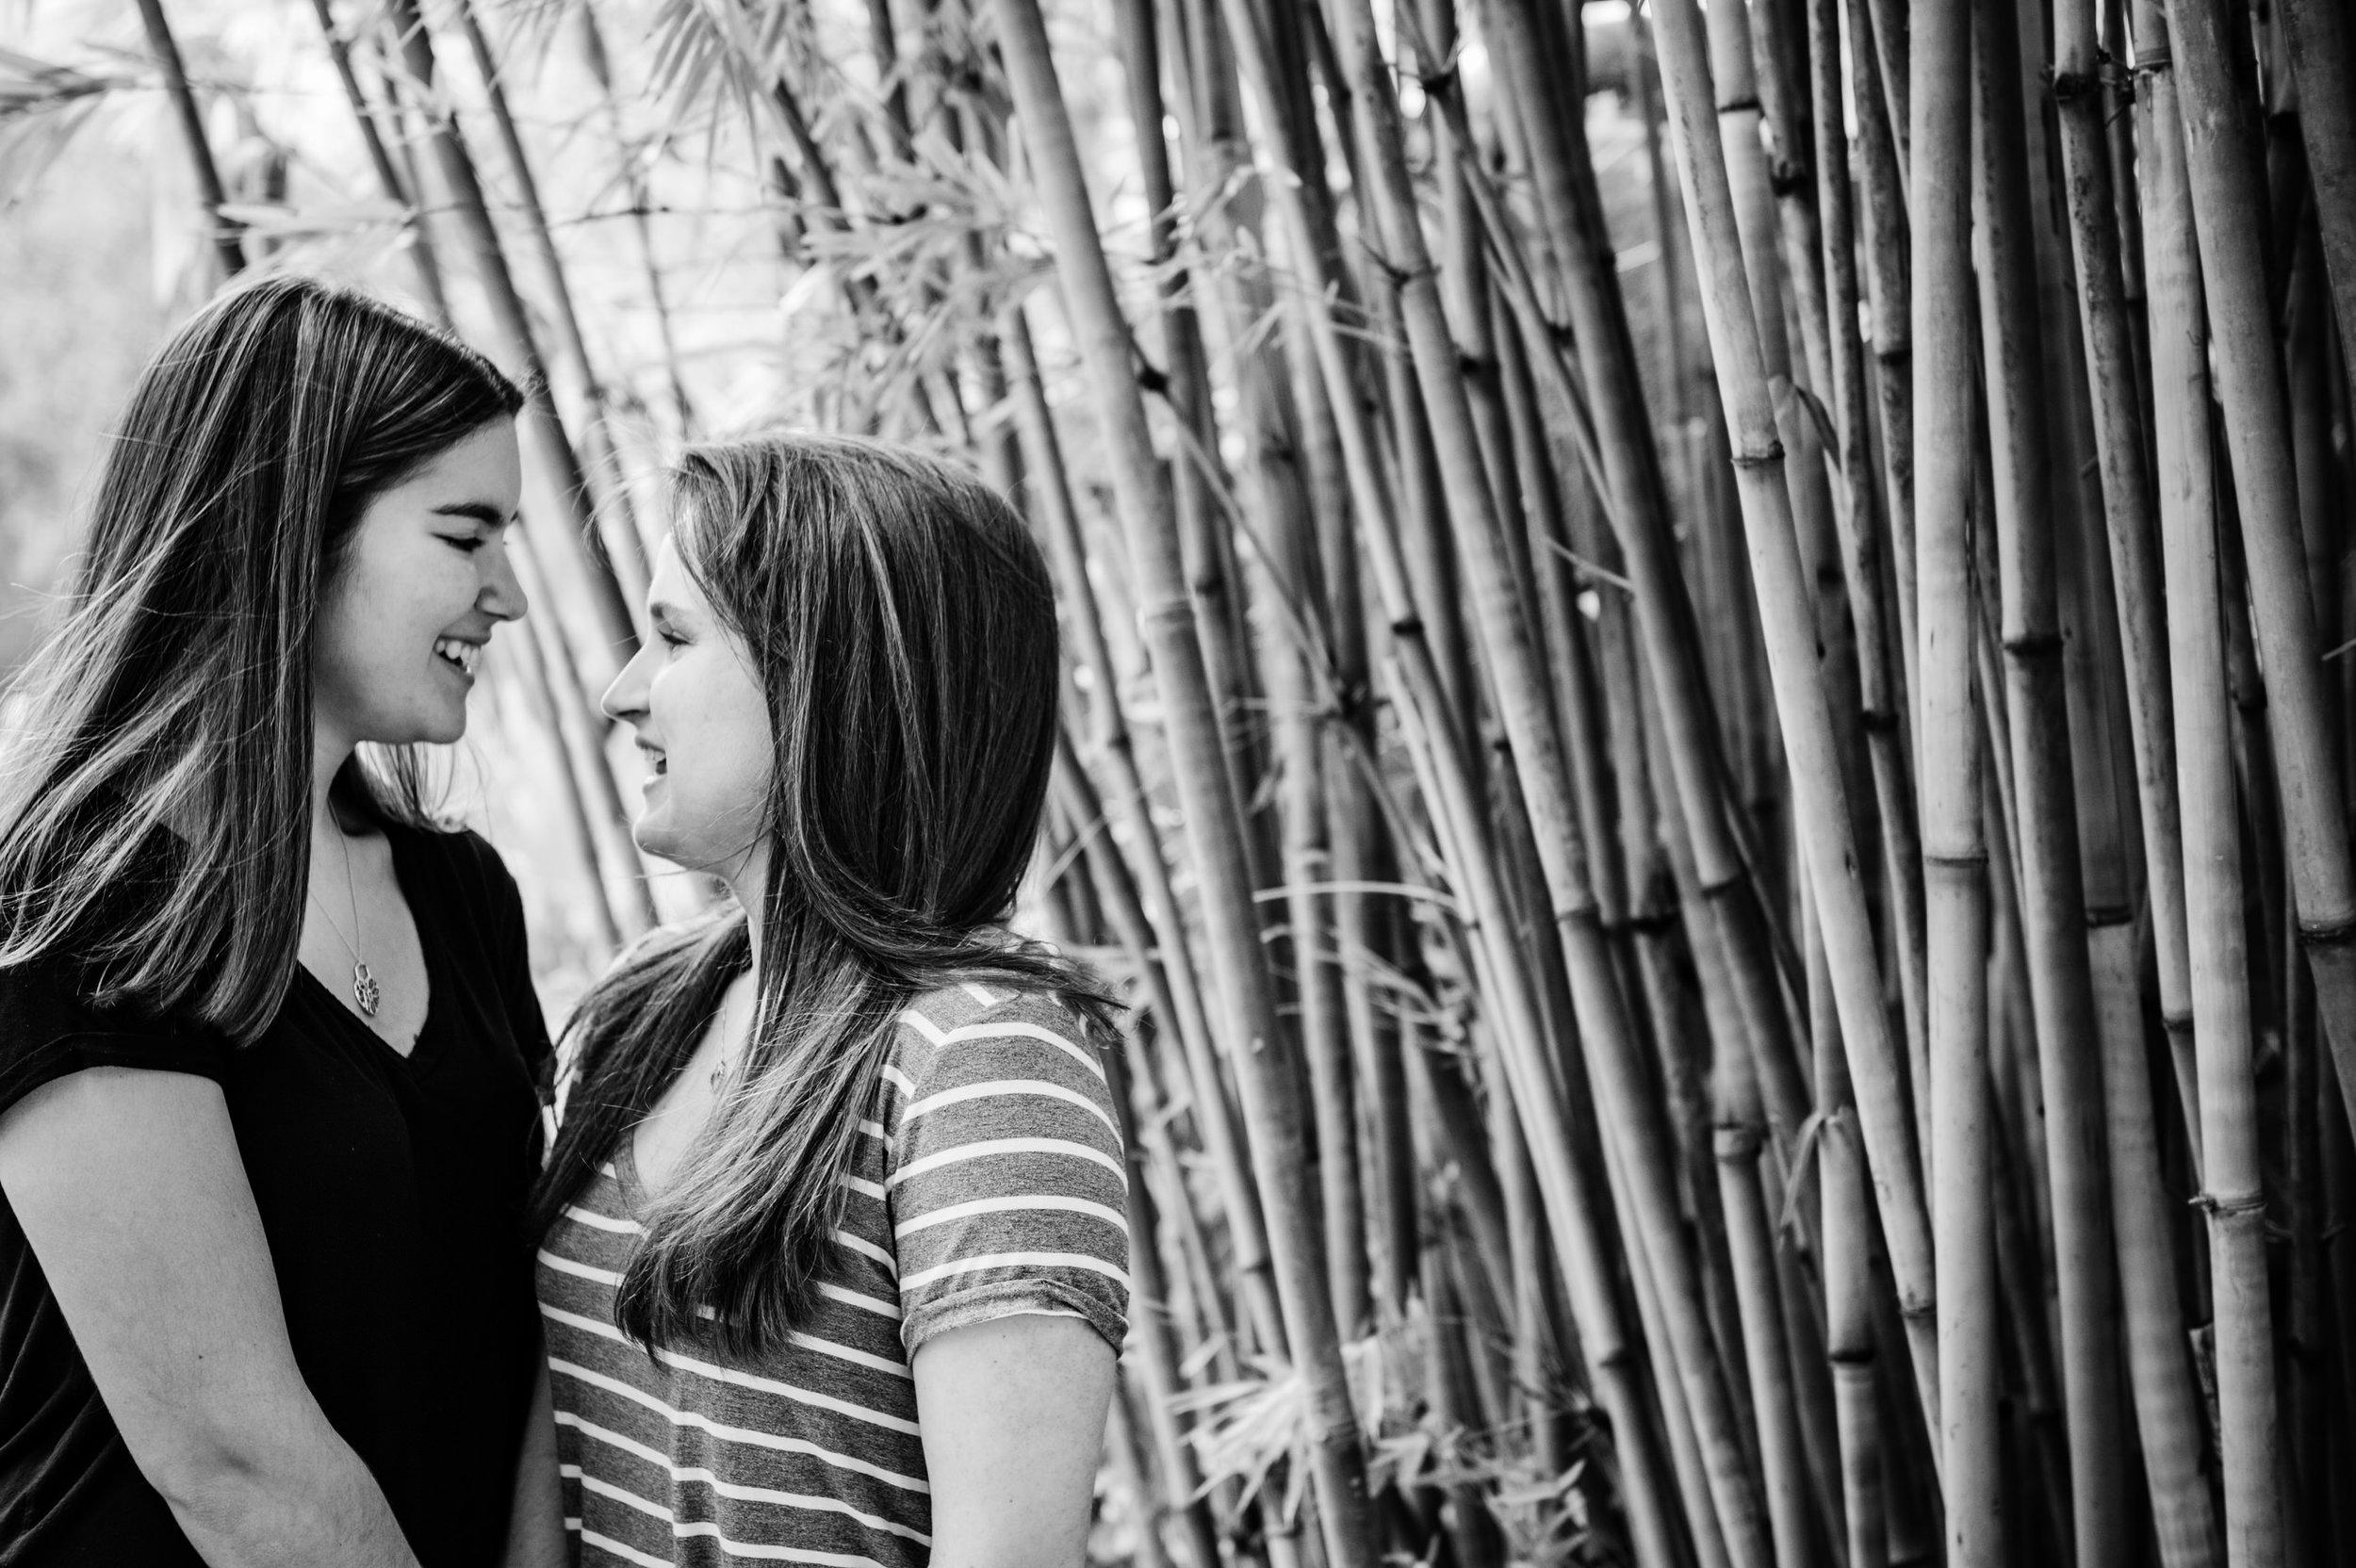 DisneyAnimation-Amanda&Shelby-5307.jpg